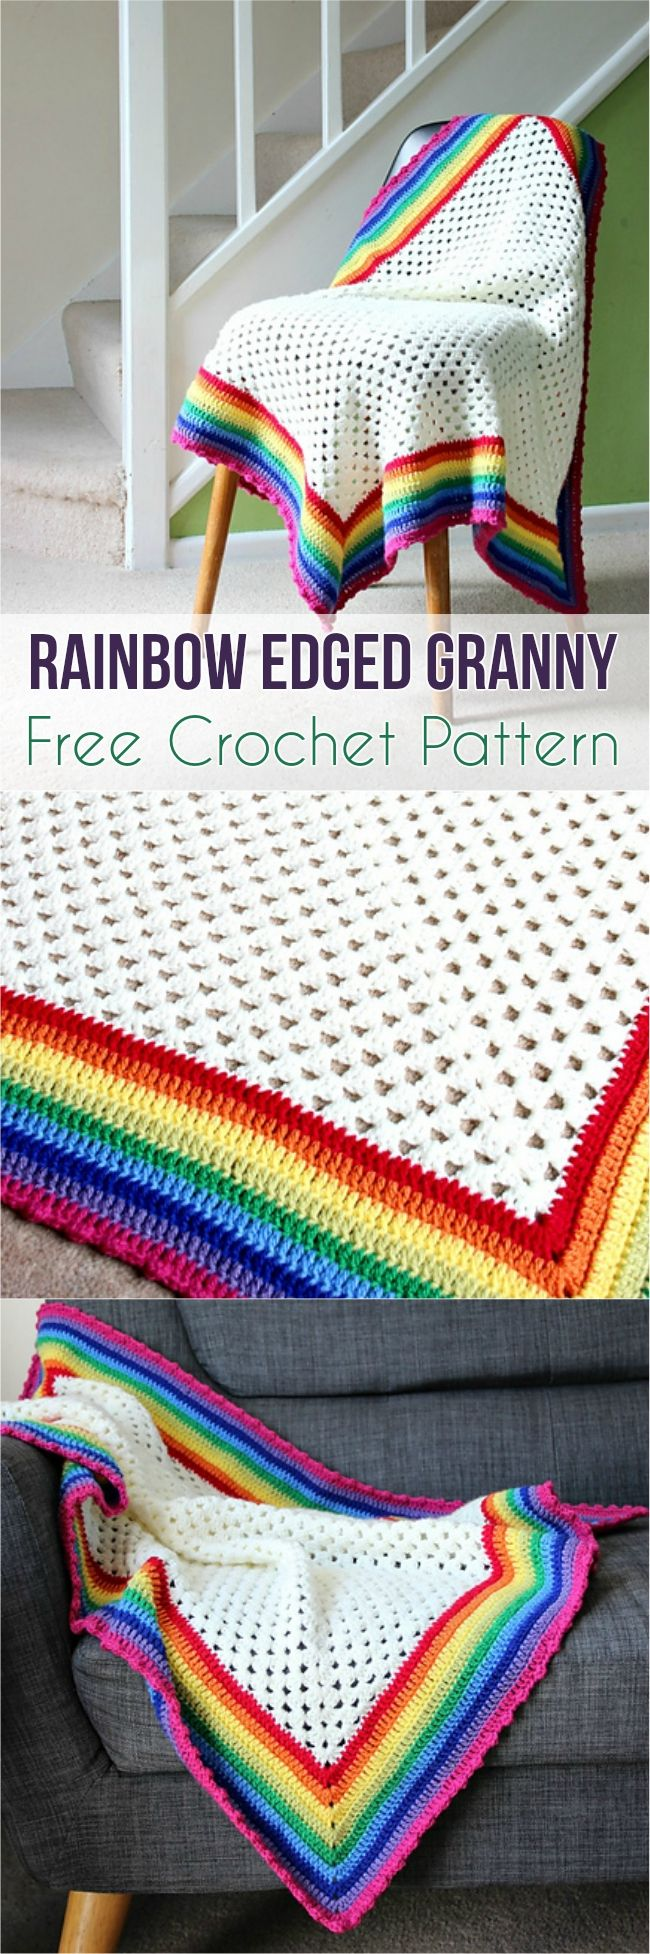 Rainbow Edged Granny Free Crochet Pattern | Ganchillo | Pinterest ...